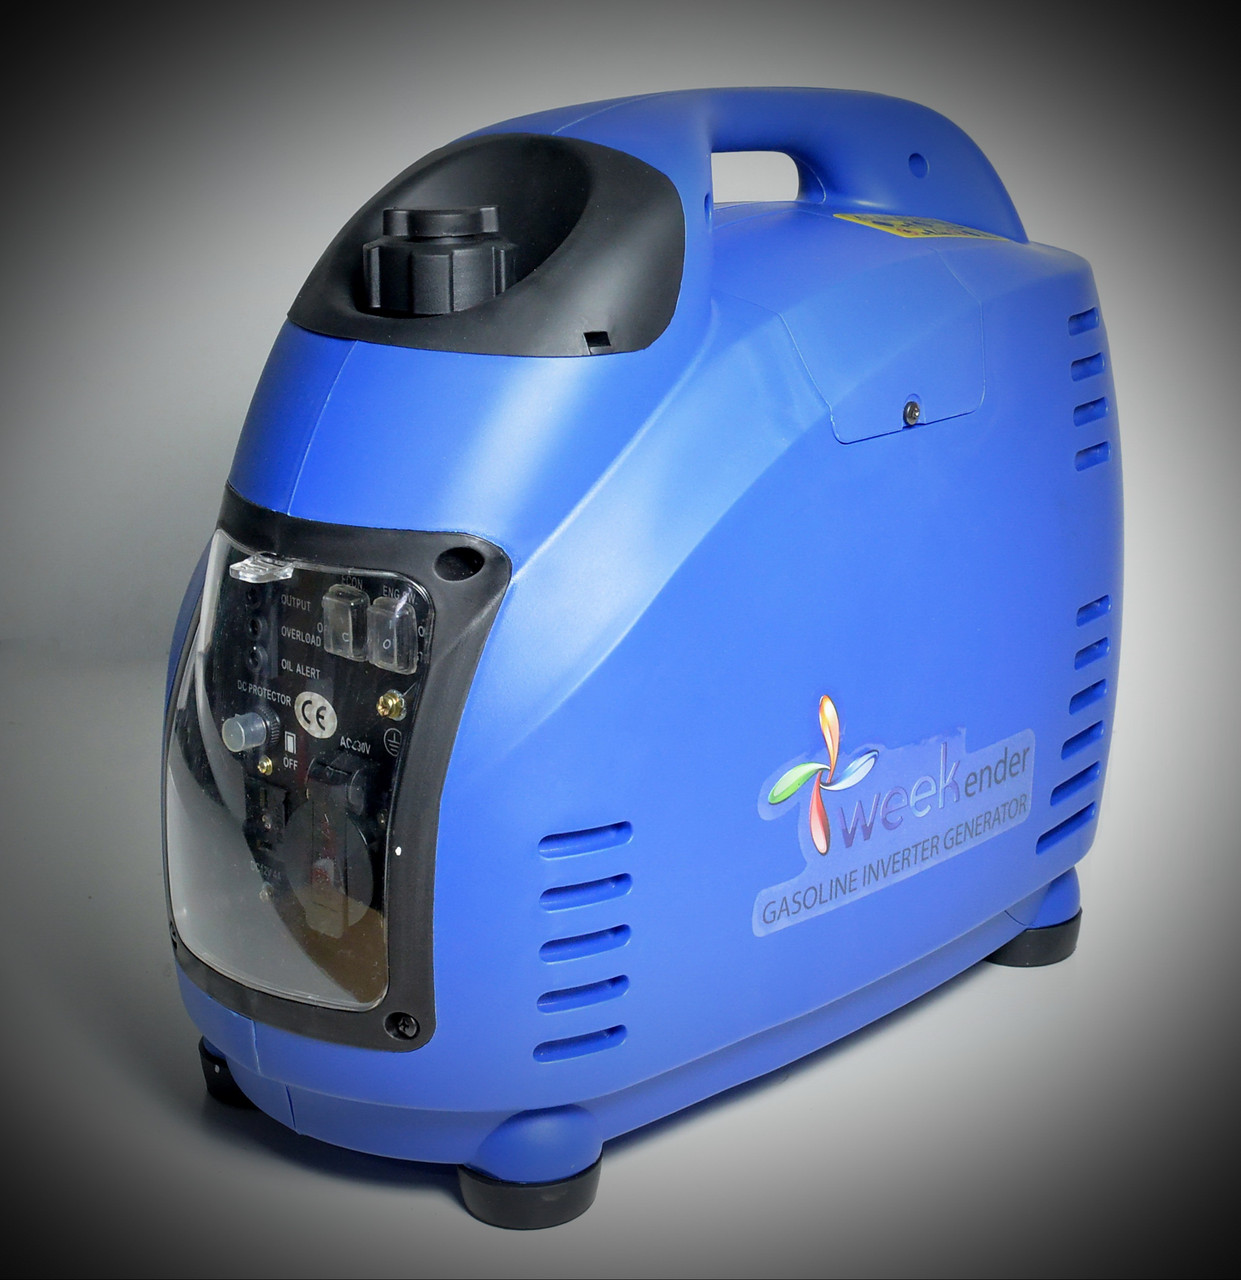 Генератор-інвертор Weekender 1,5 кВт D1500i